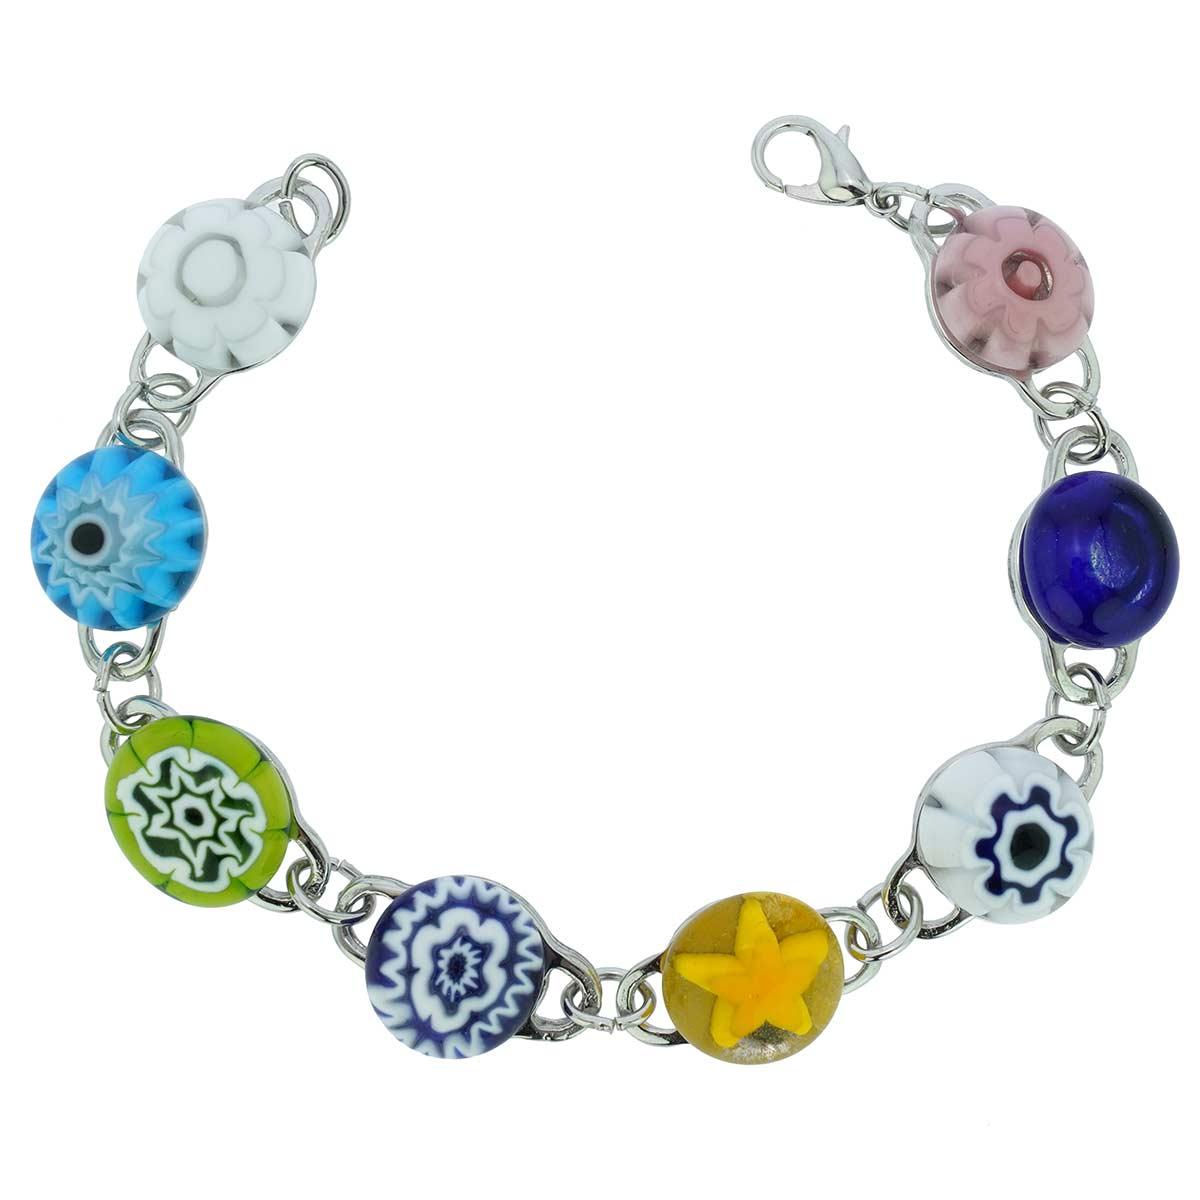 Millefiori Murano Glass Bracelet - Multicolor